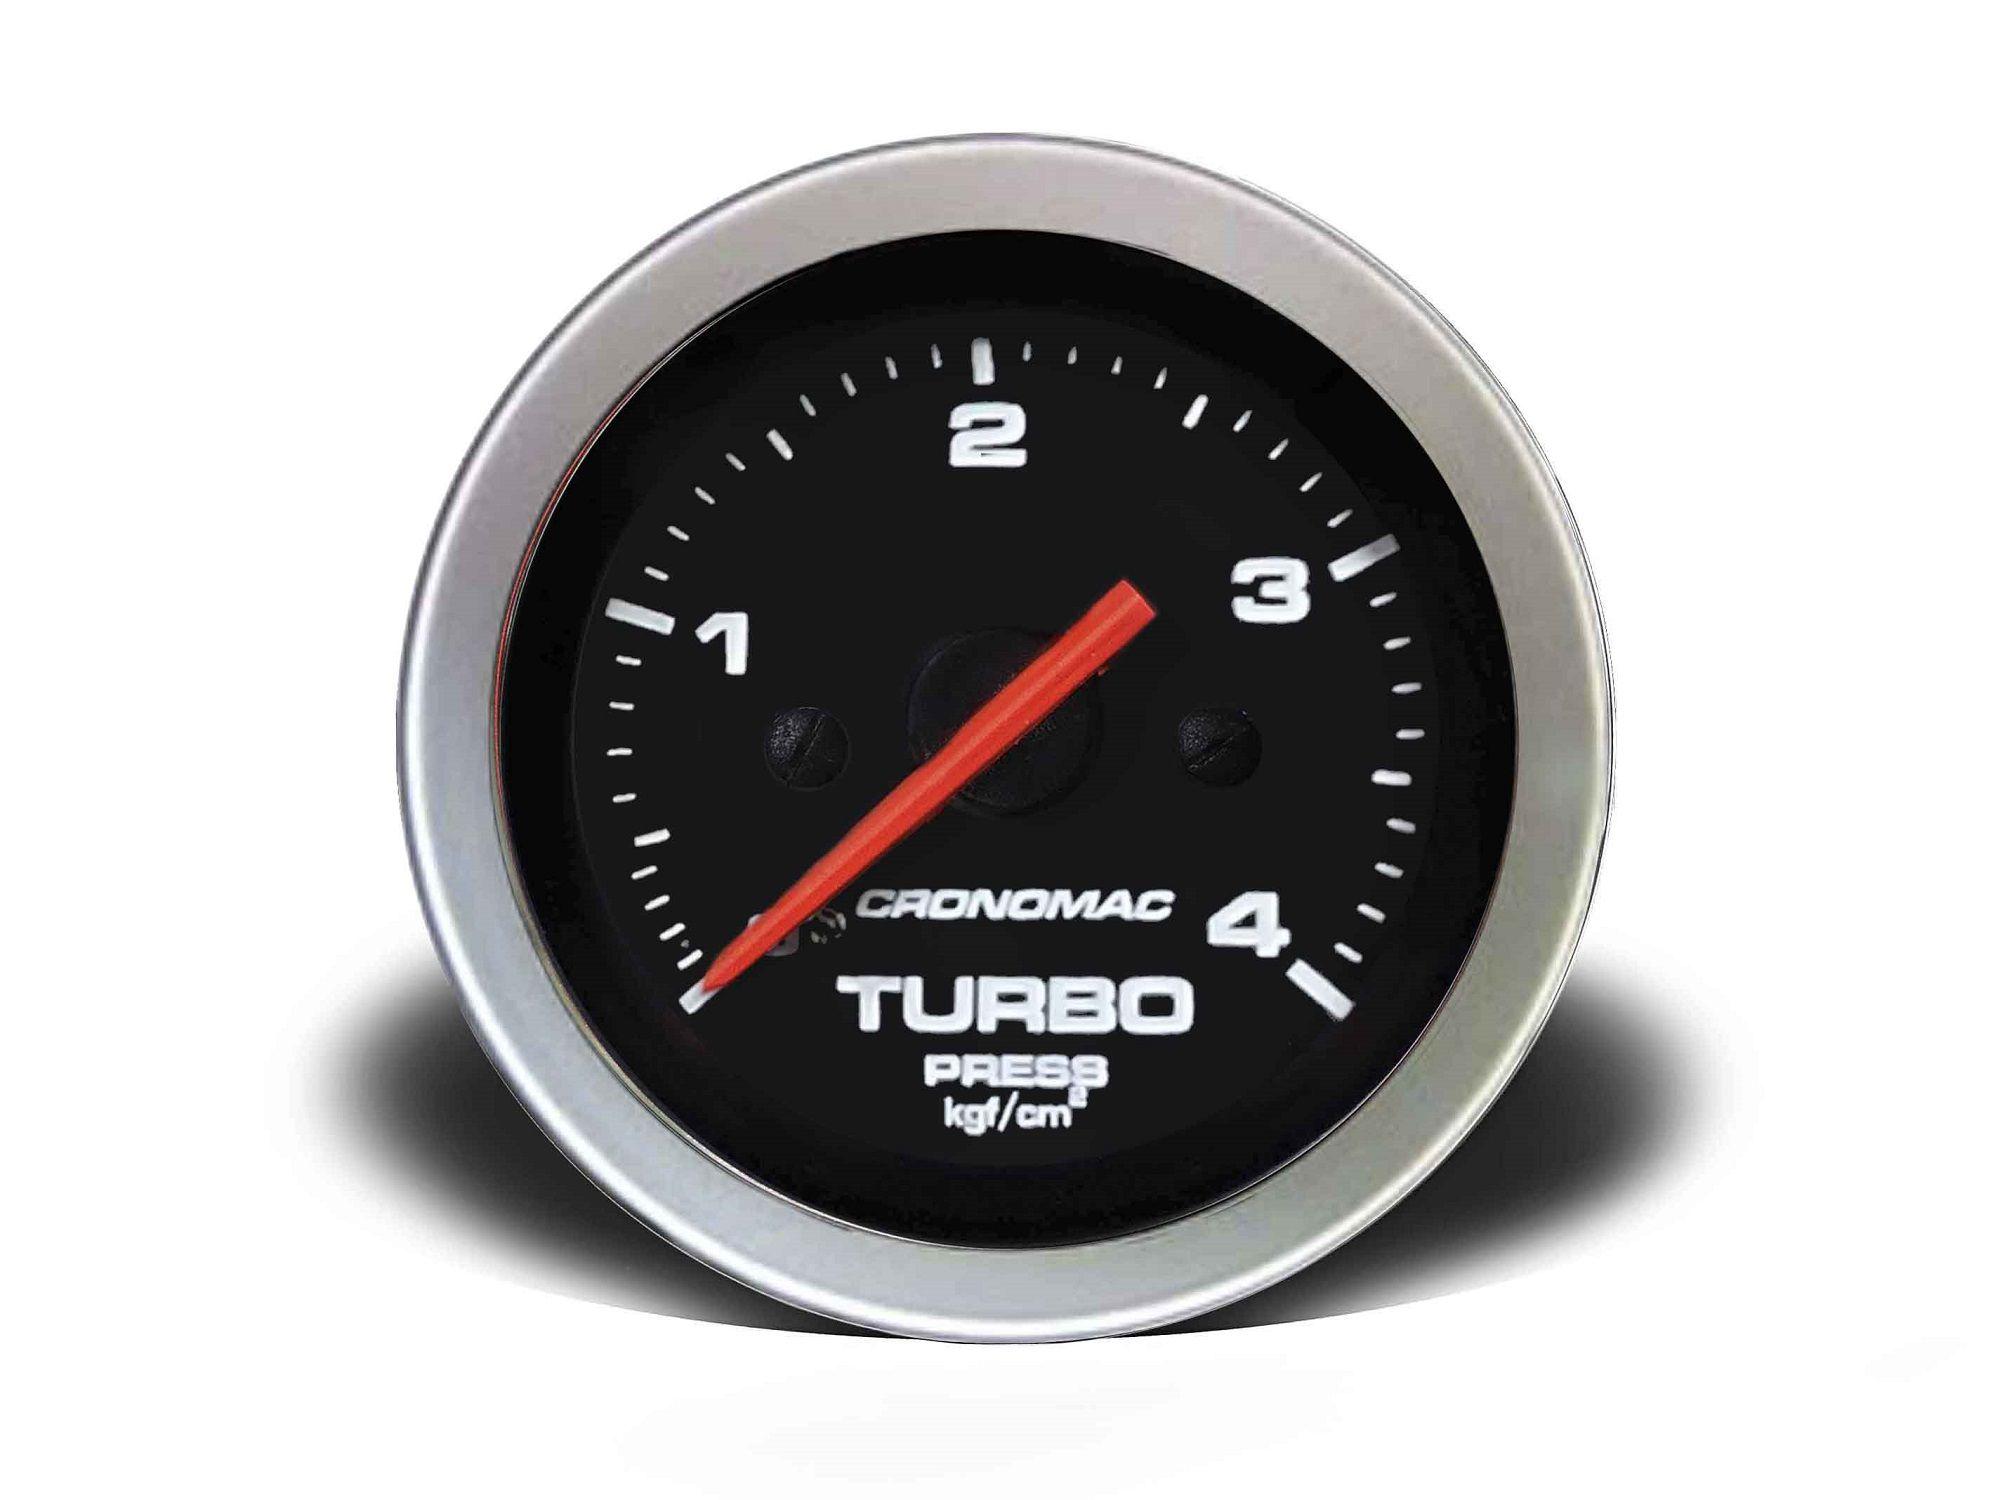 Relogio Pressao de Turbo 4kg Sport 52mm Cronomac